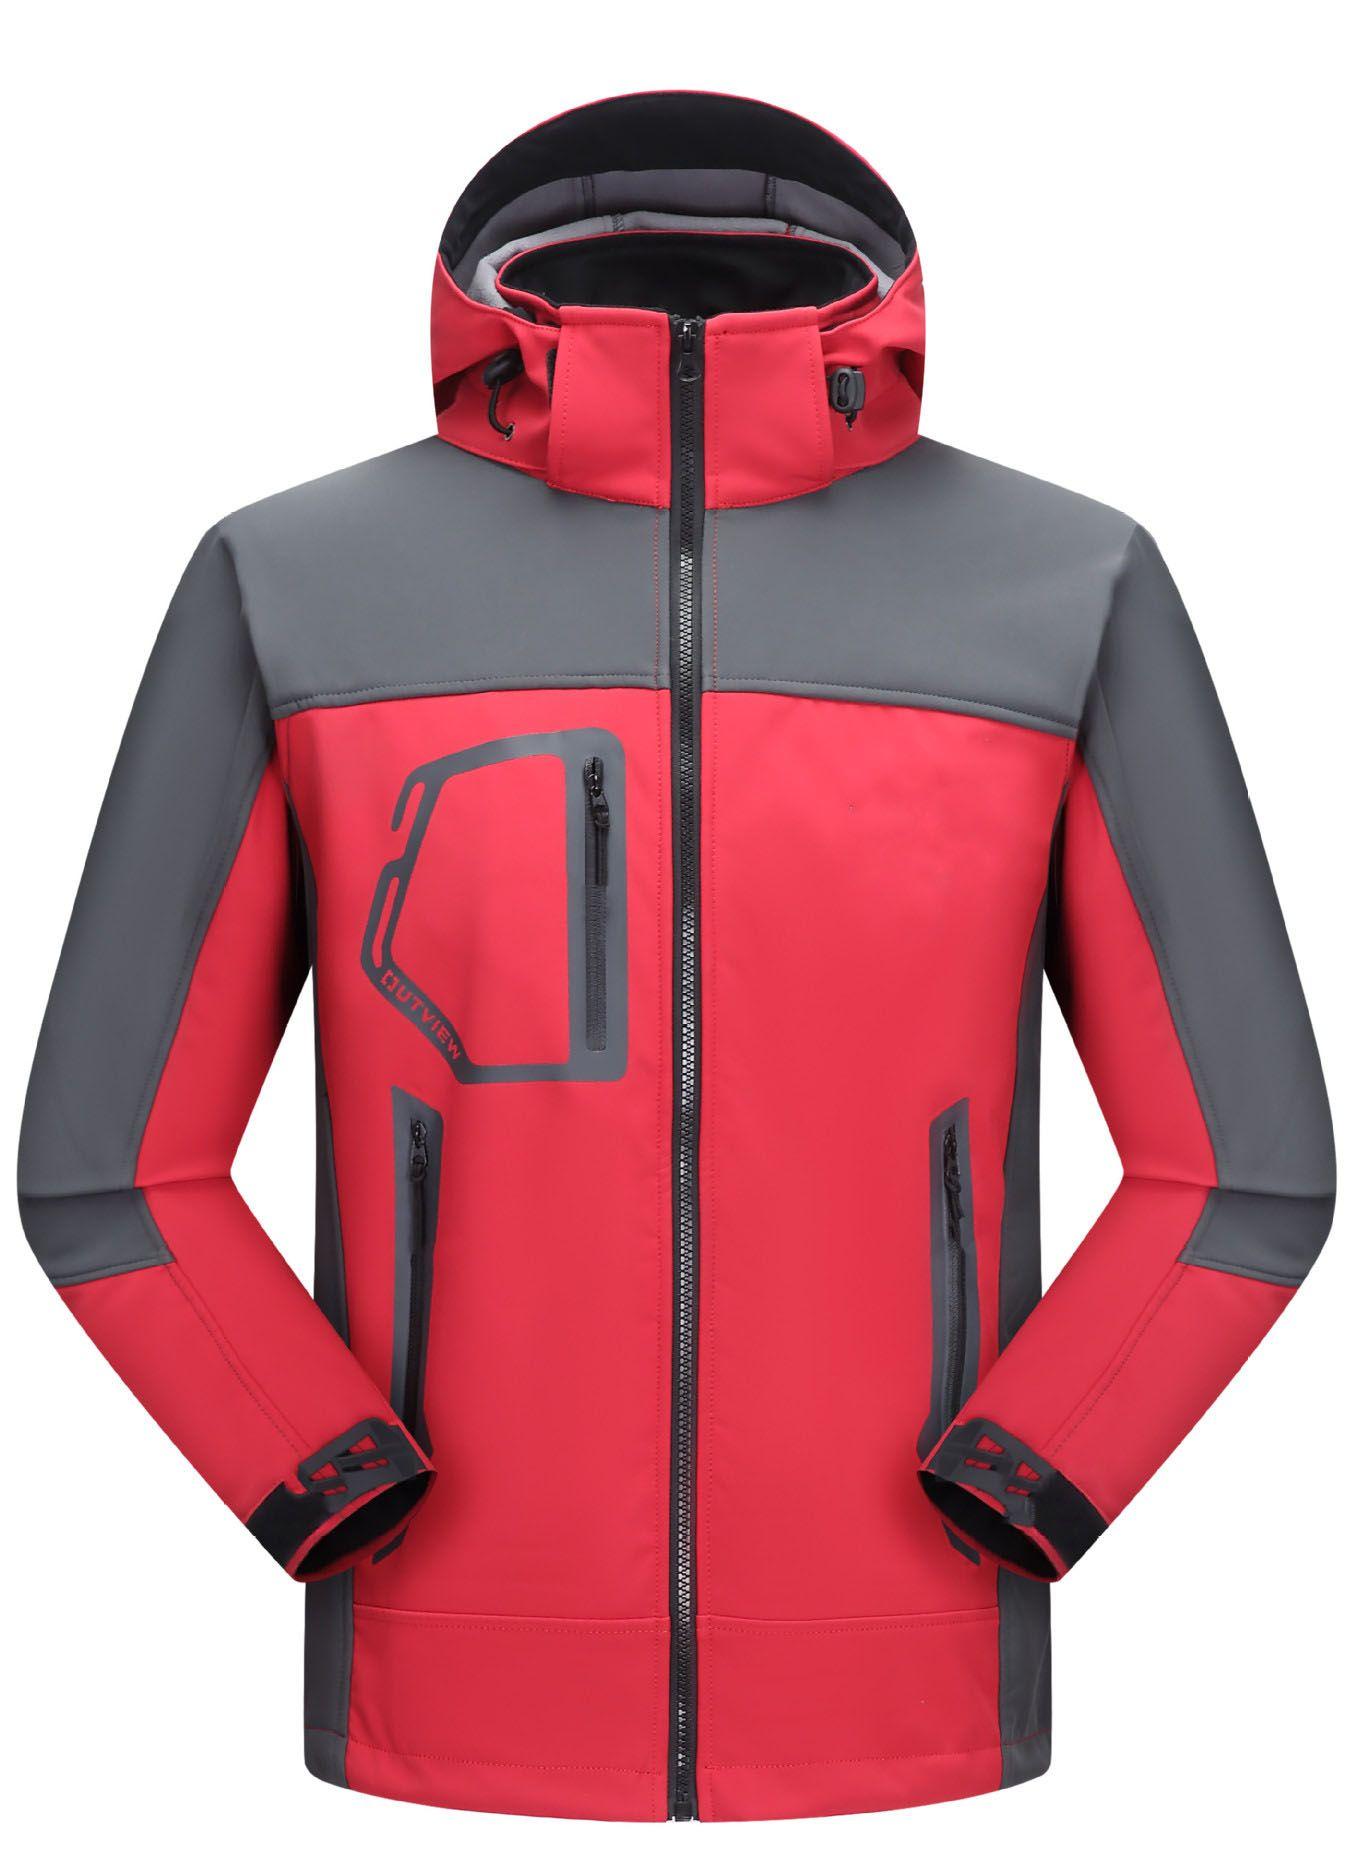 20stop Männer wasserdichte atmungsaktive Softshell Jacket Men Im Freien Sport Mäntel Ski Wandern Winddichtes Winter-Outwear Soft Shell Jacke Männer wandern